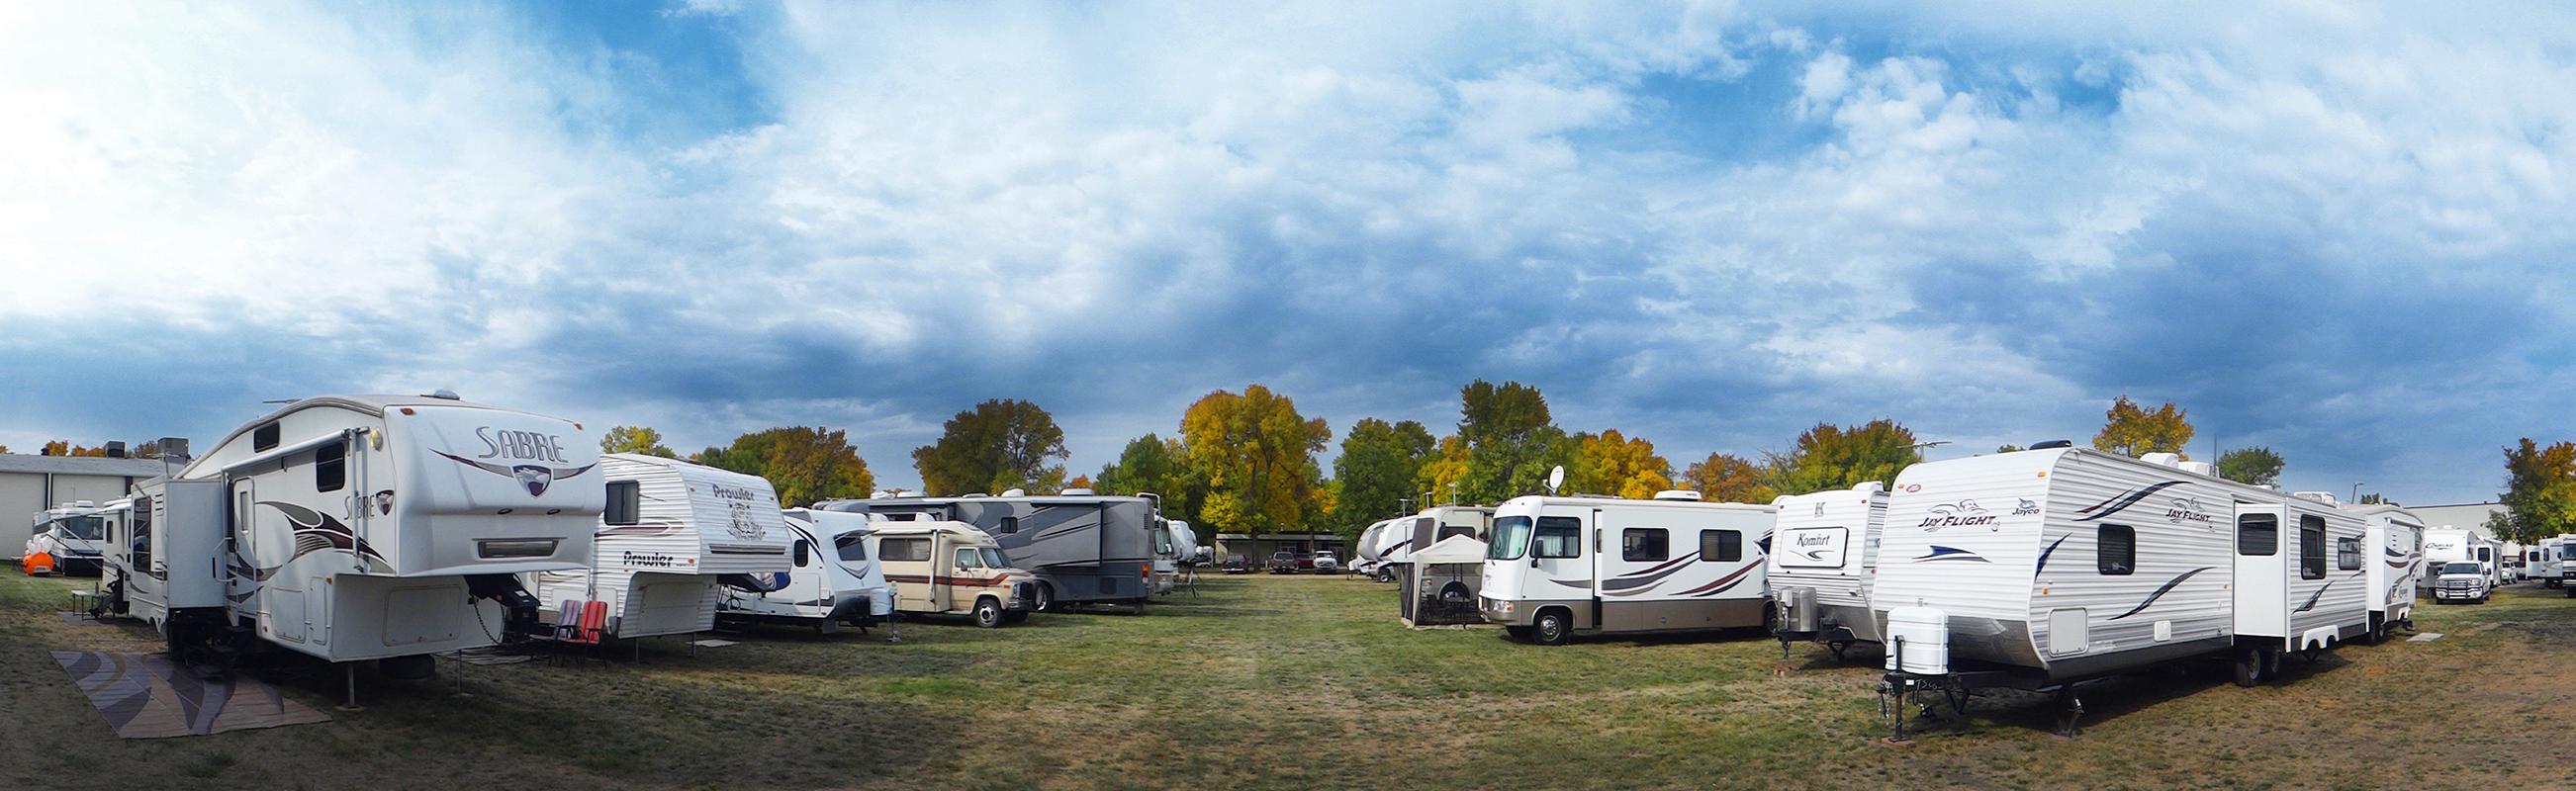 Hostfest_RV Parking